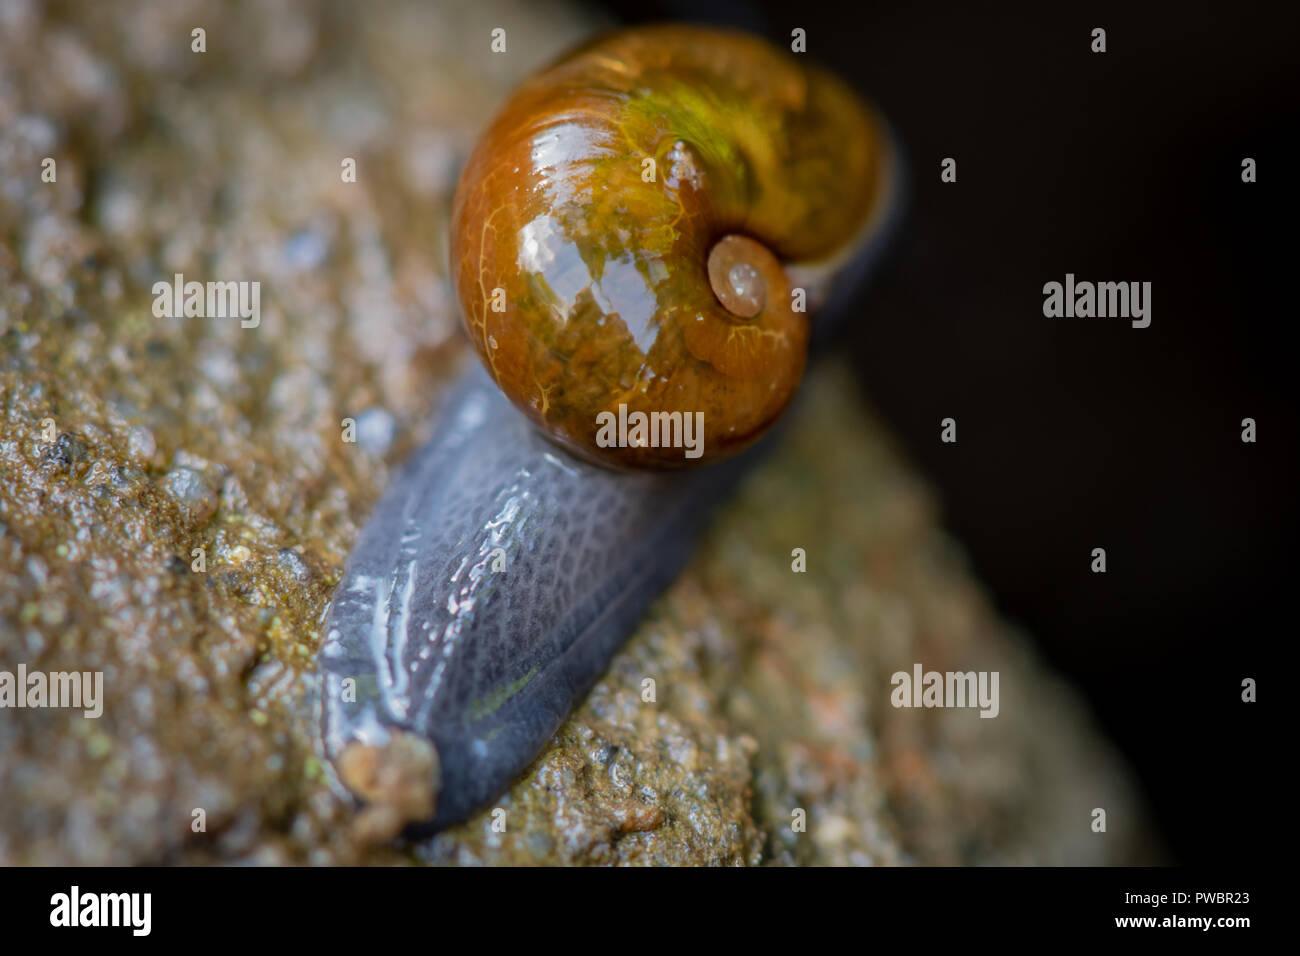 Slimy Snail Crawls on Log in the Smokies Stock Photo